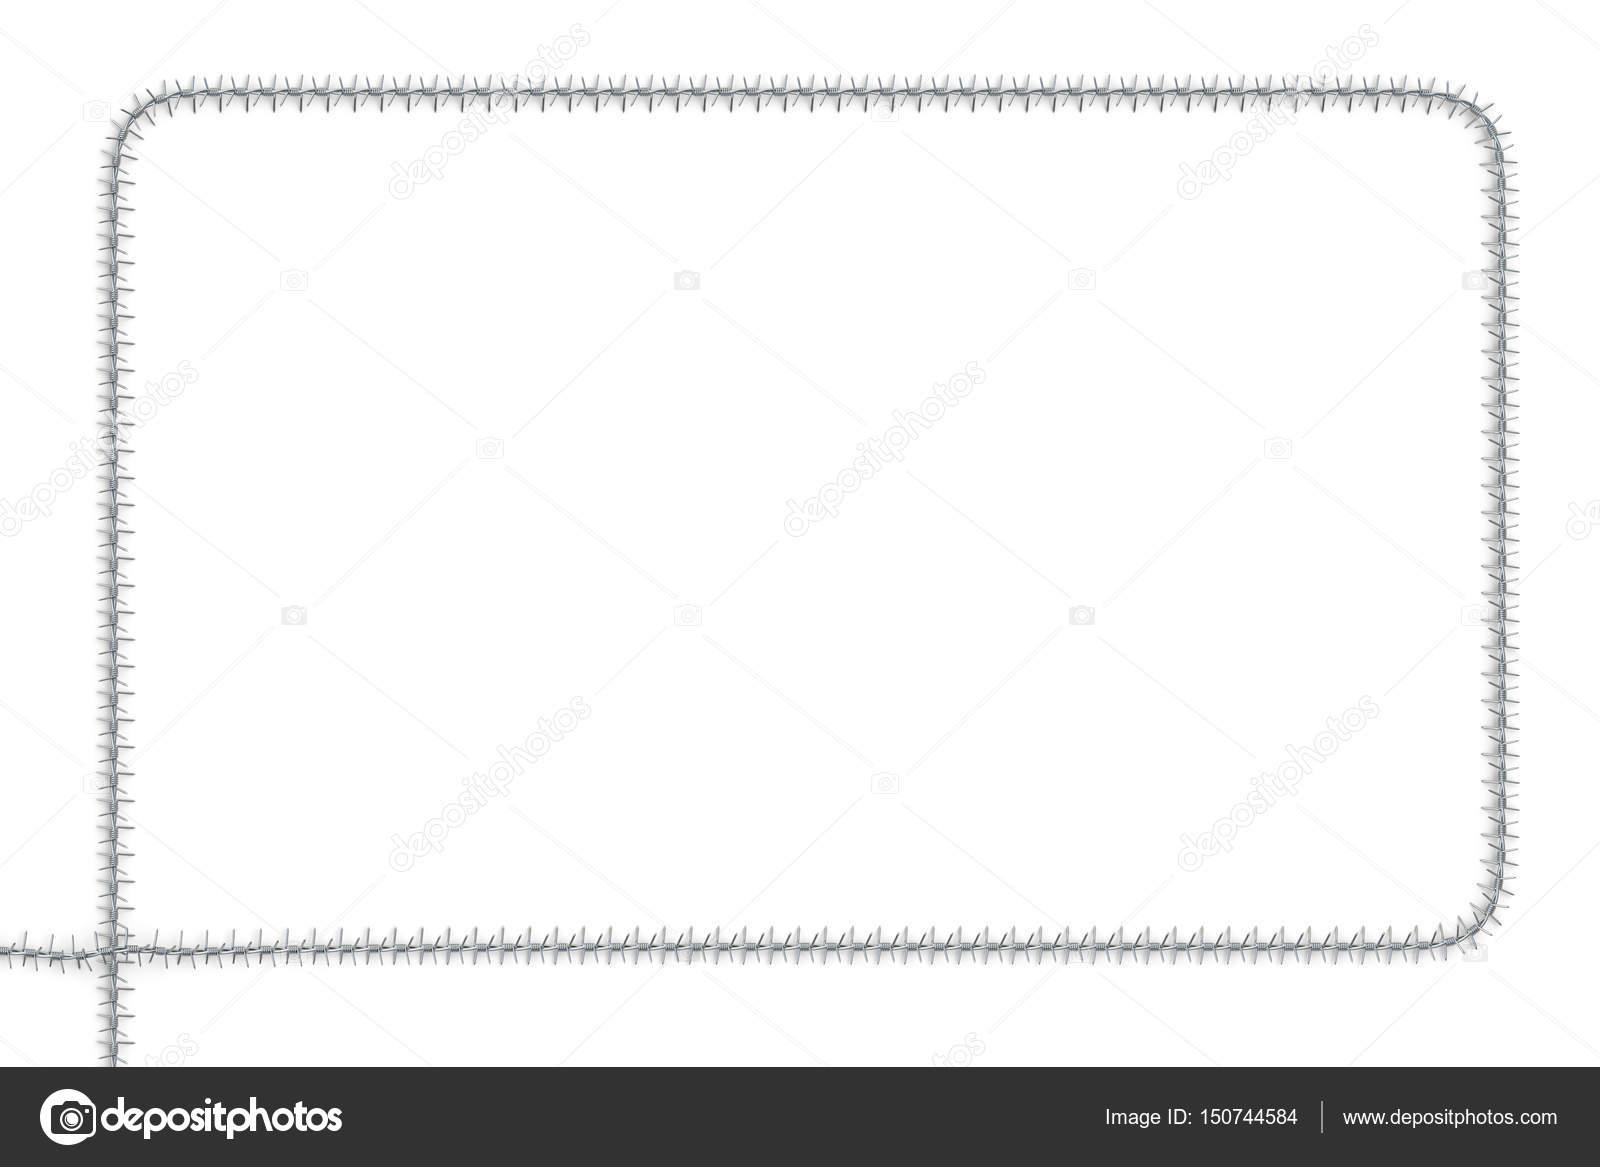 Rahmen aus Stacheldraht, 3D-Rendering — Stockfoto © alexlmx #150744584